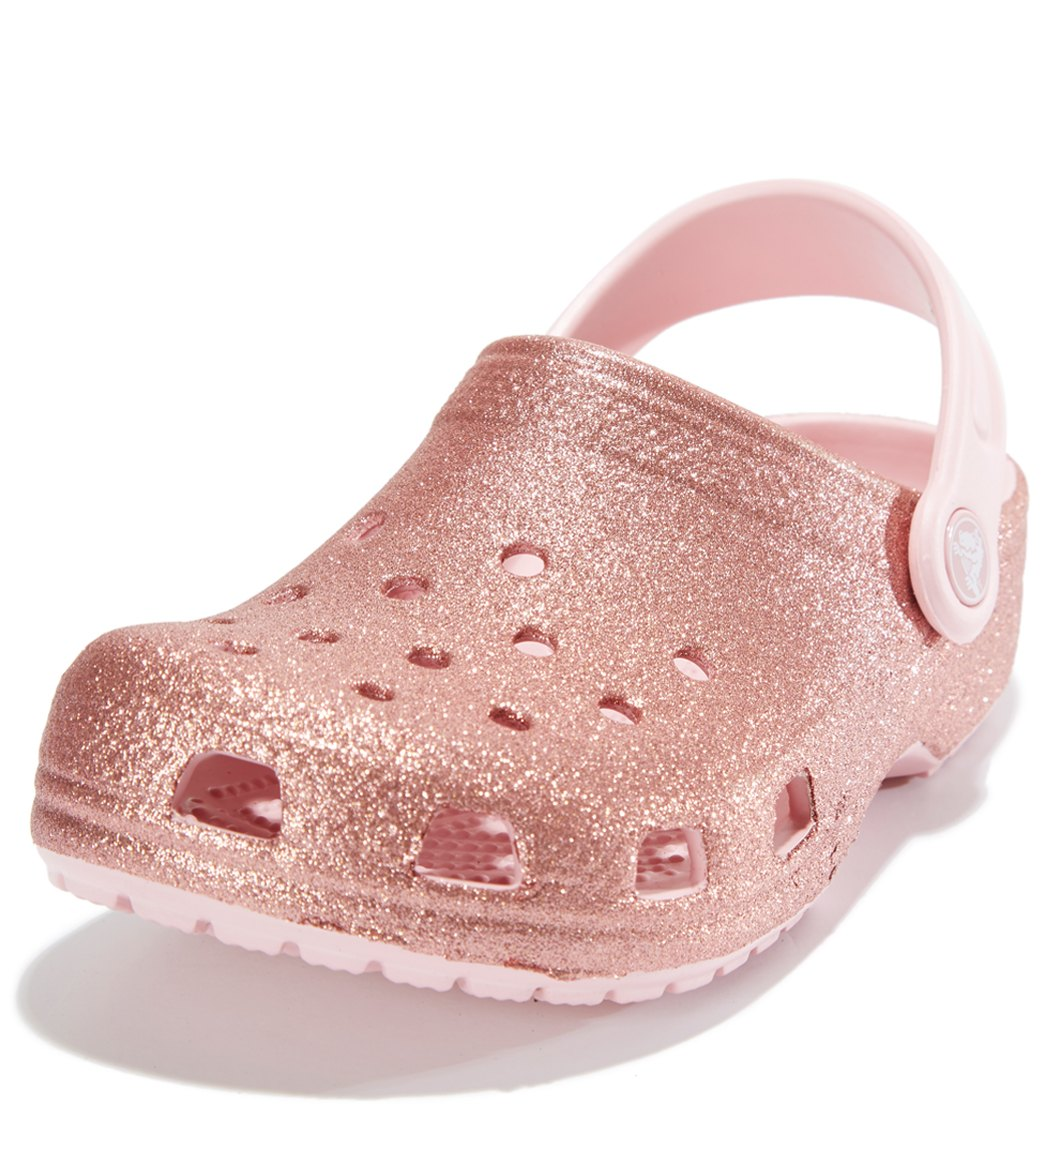 1b8262f2259f Crocs Kids  Classic Glitter Clog (Toddler